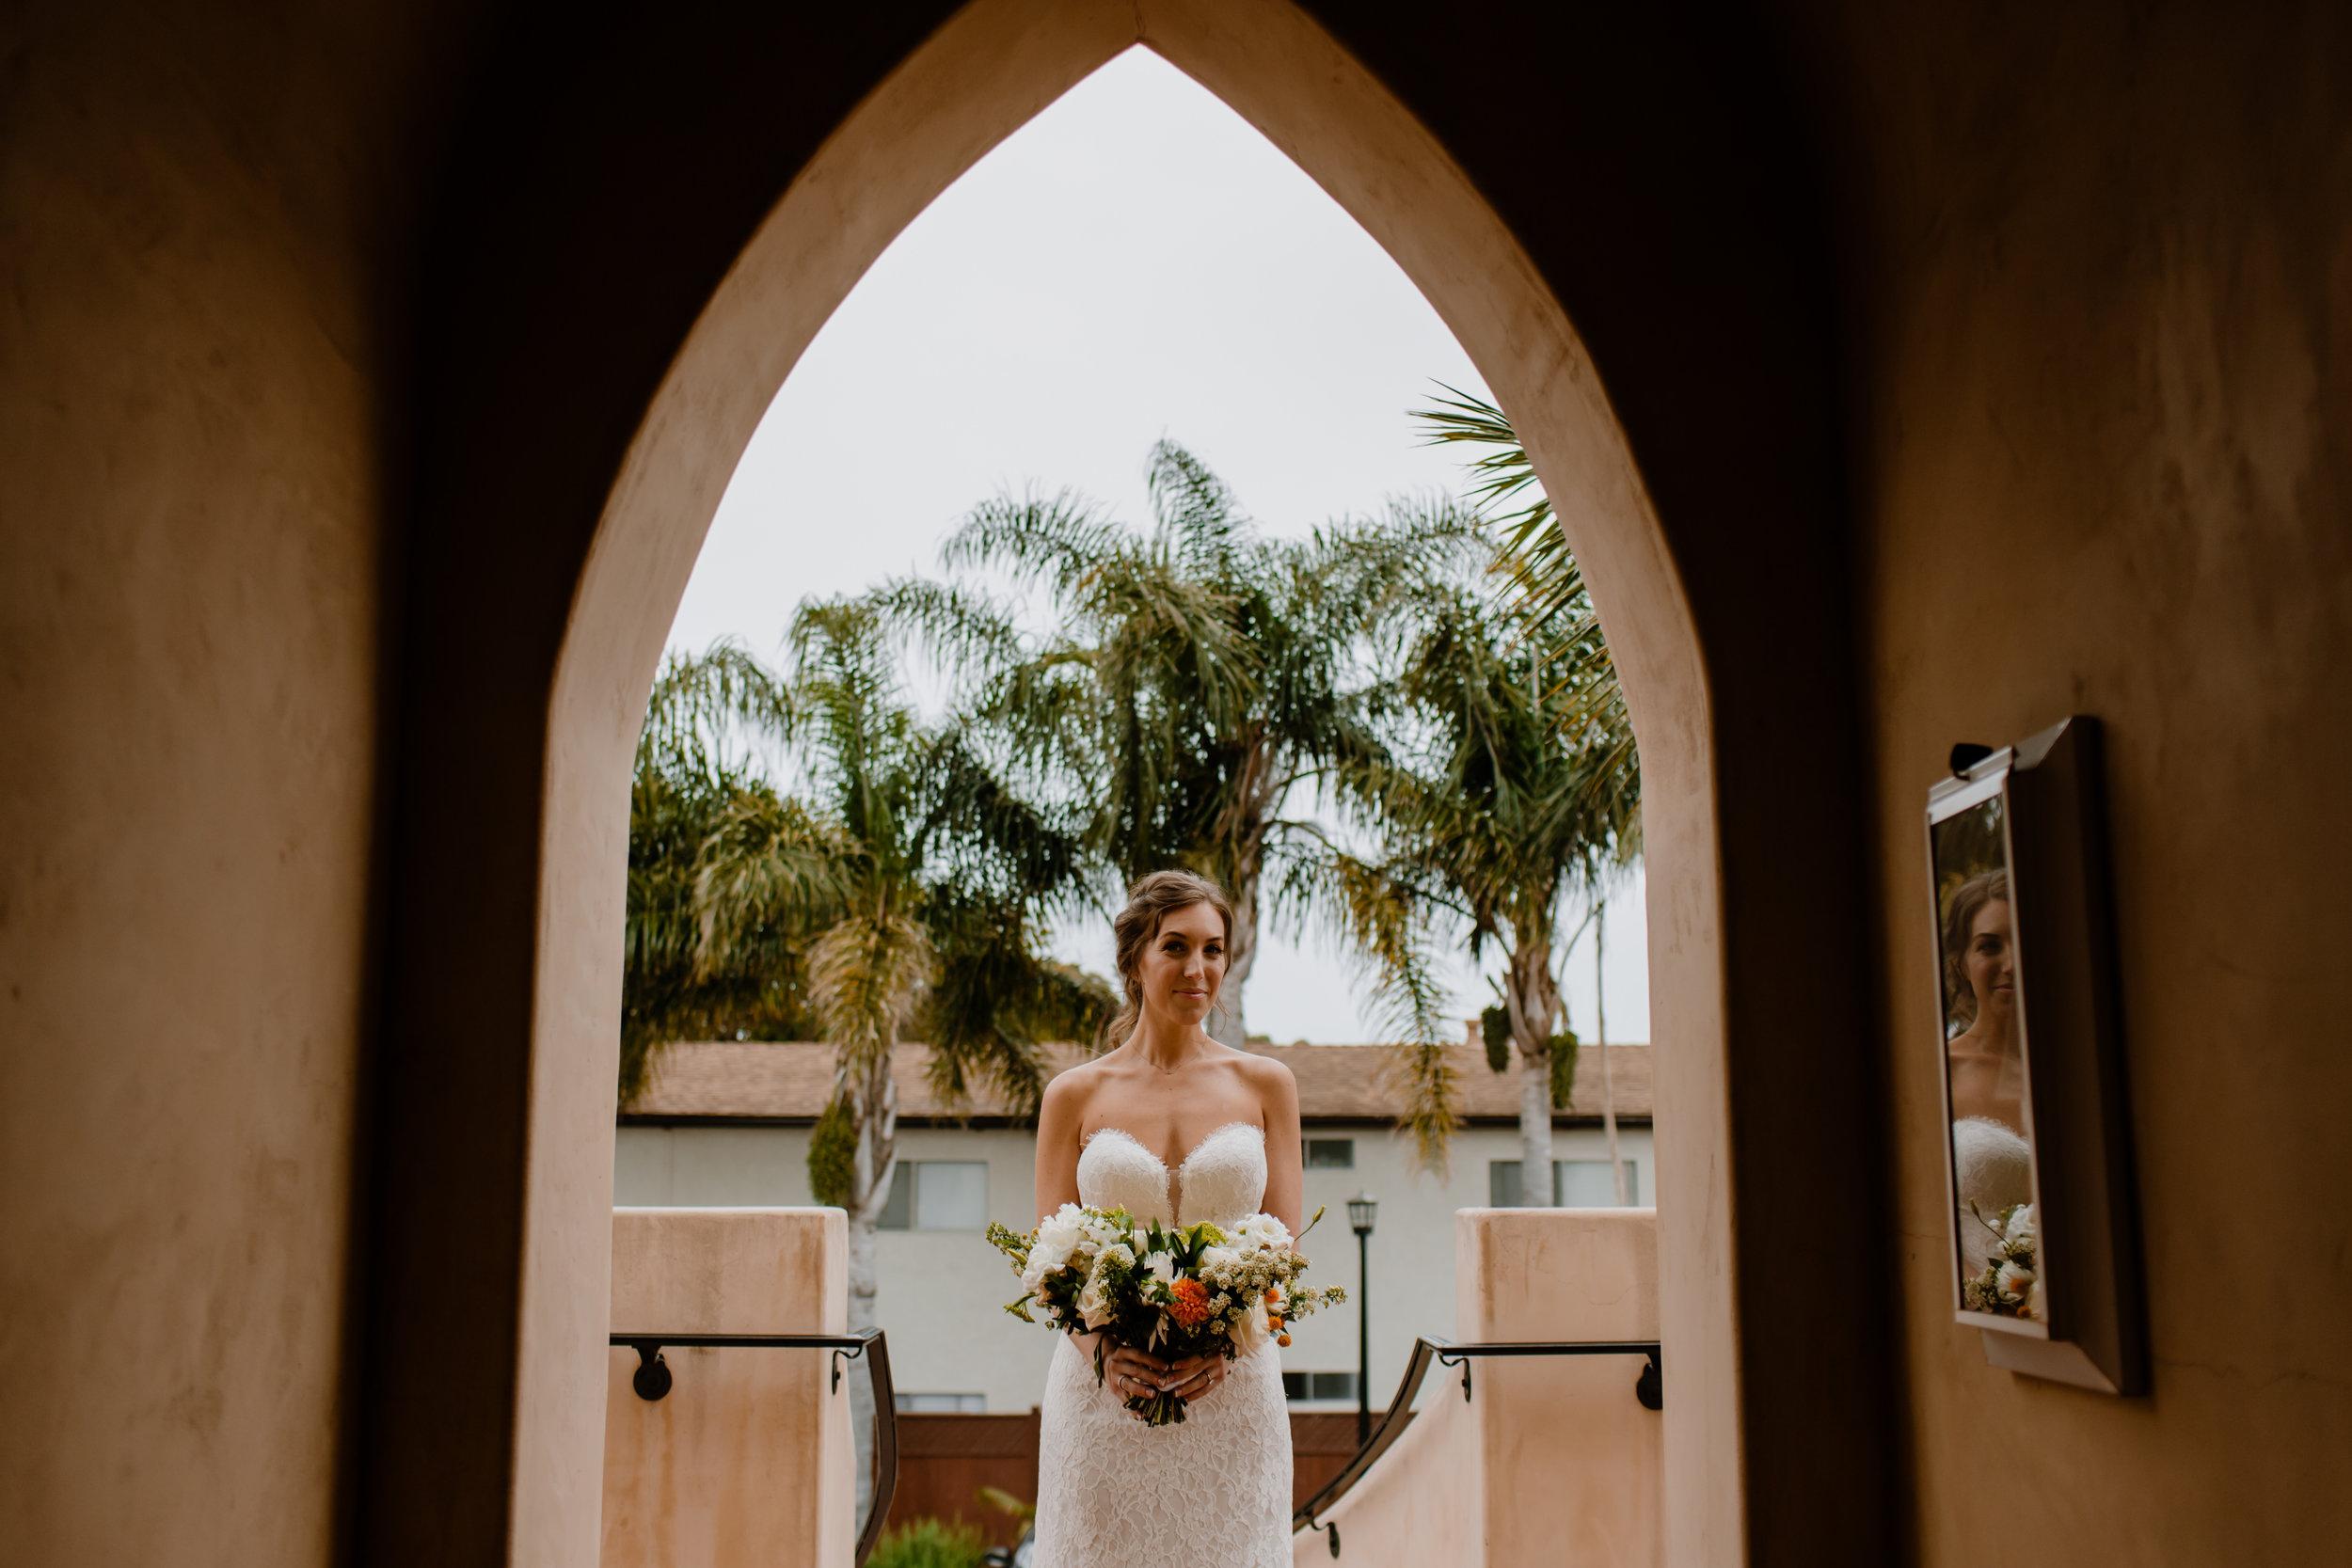 Robin and John Santa Barbara Wedding - Eve Rox Photography-38.jpg